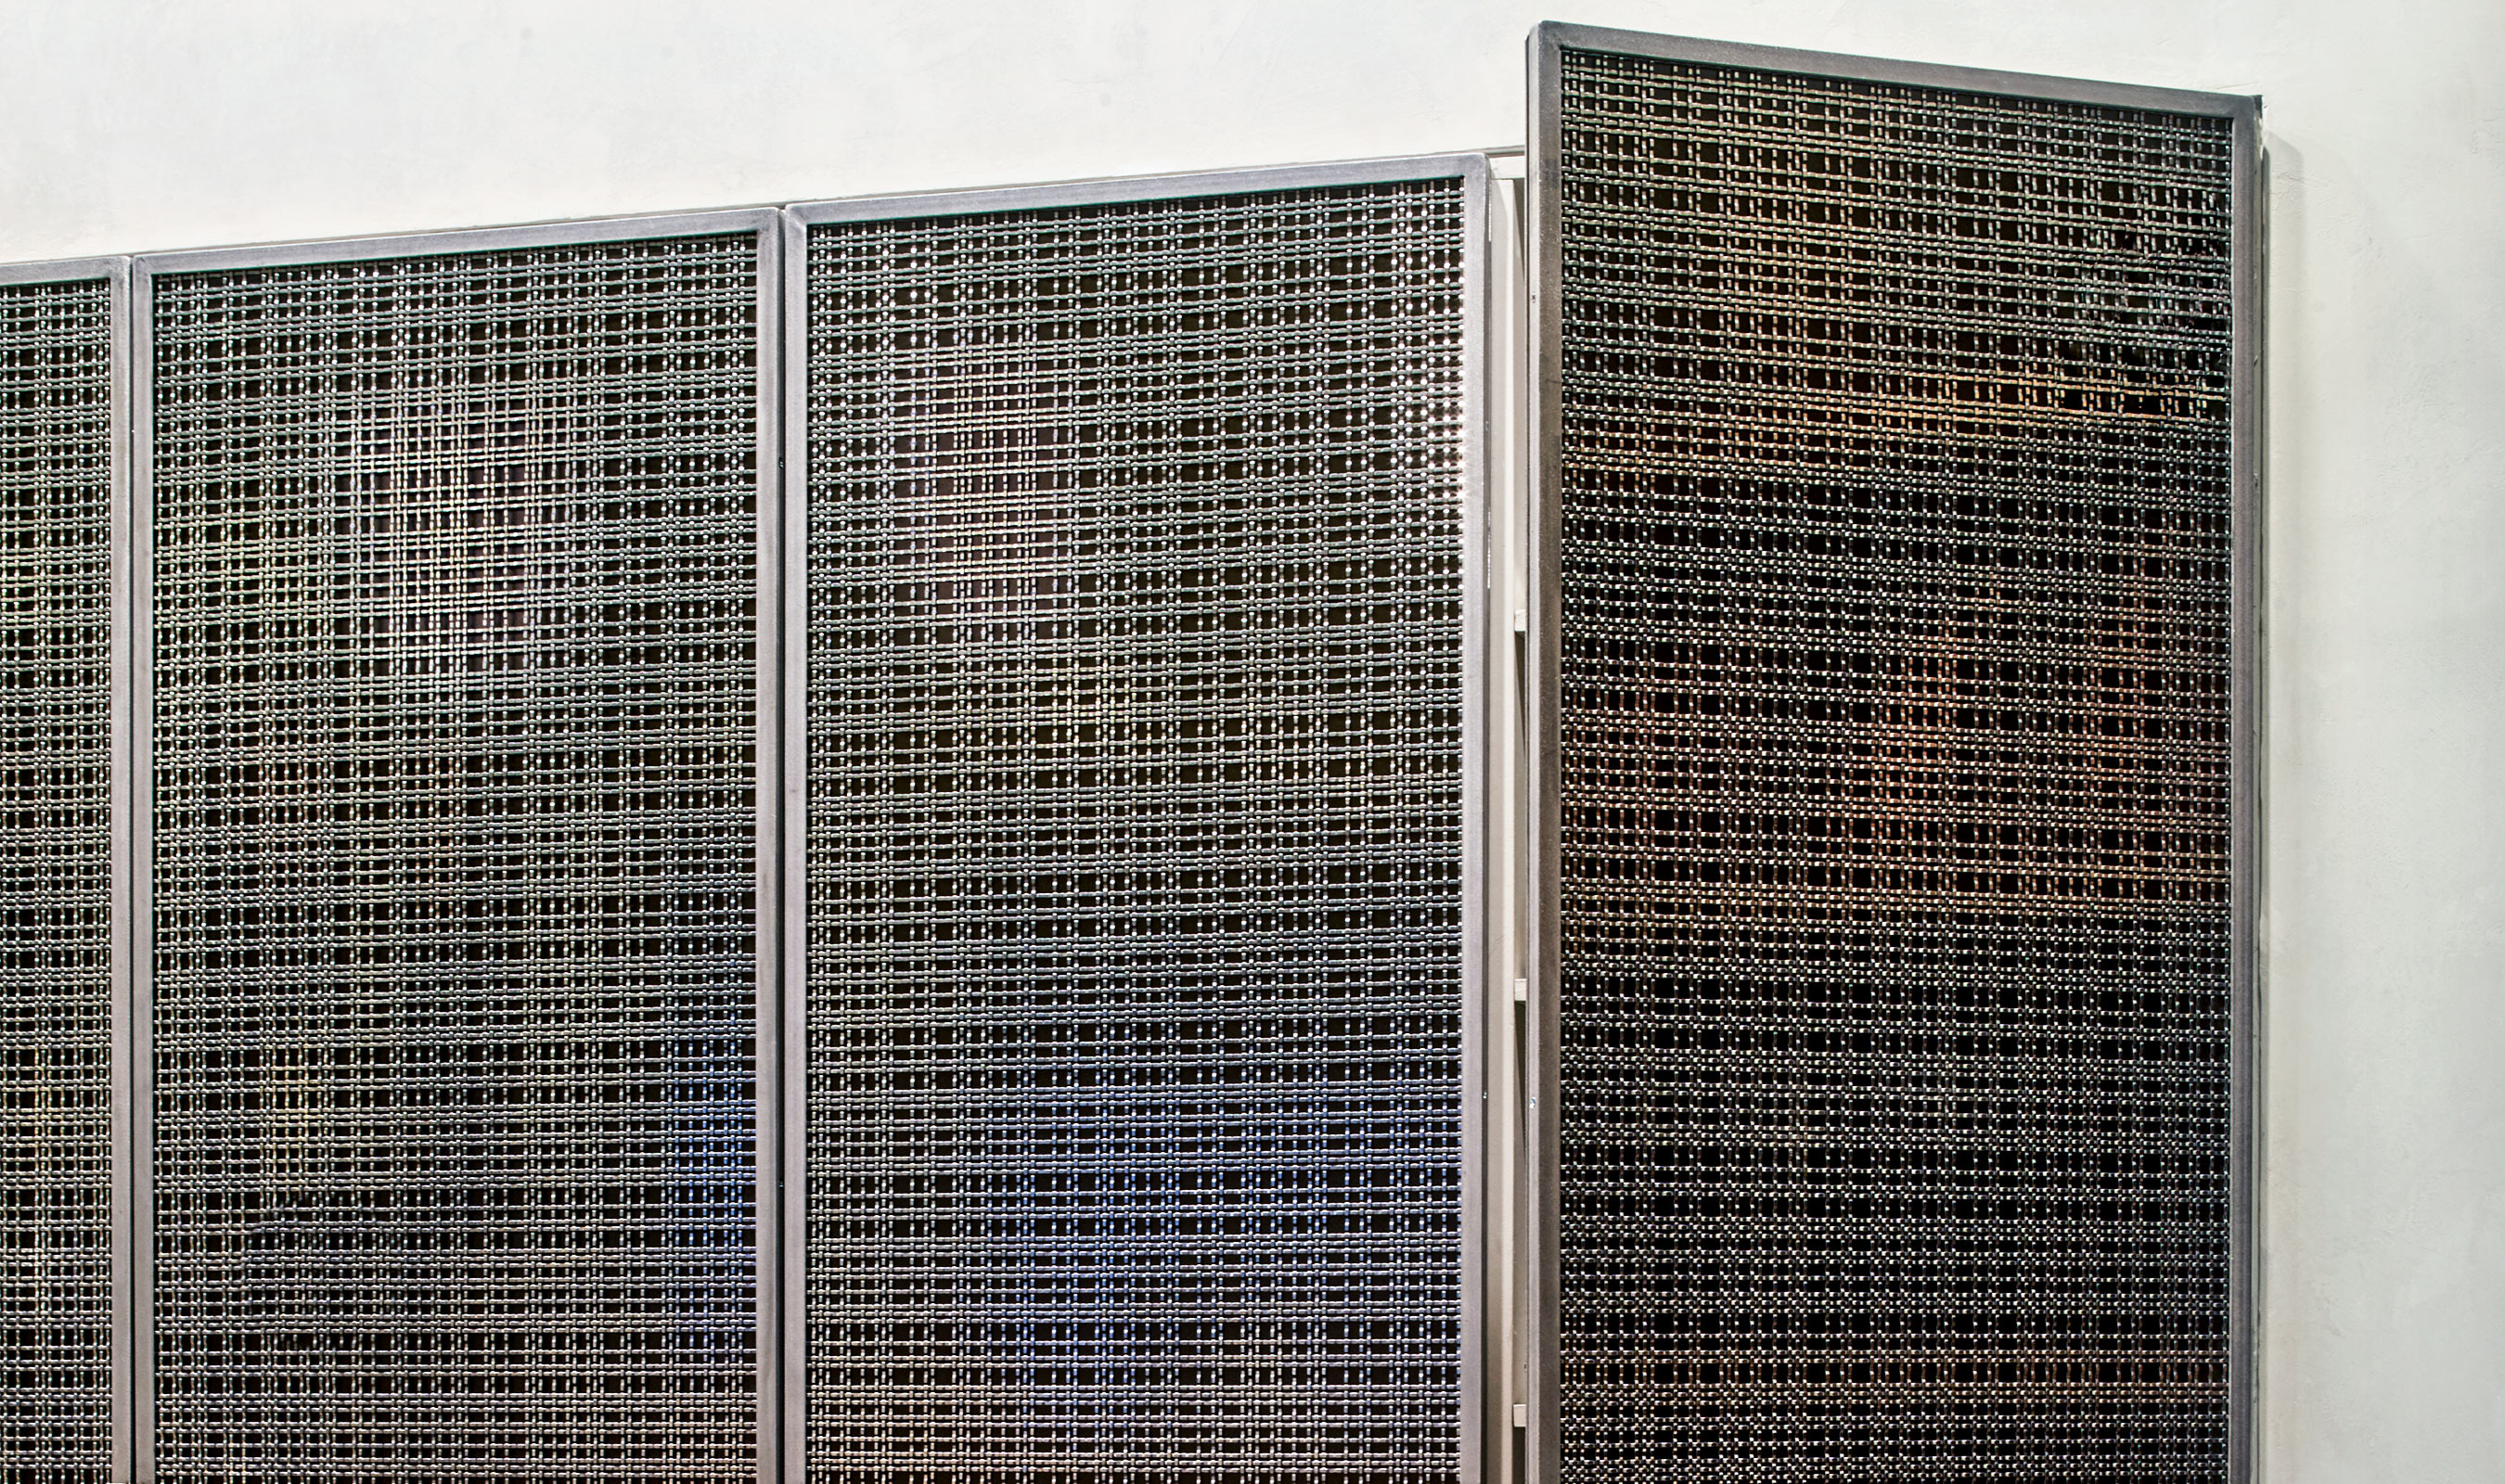 SJD-21 wire mesh pattern in Stainless Steel as Door fronts